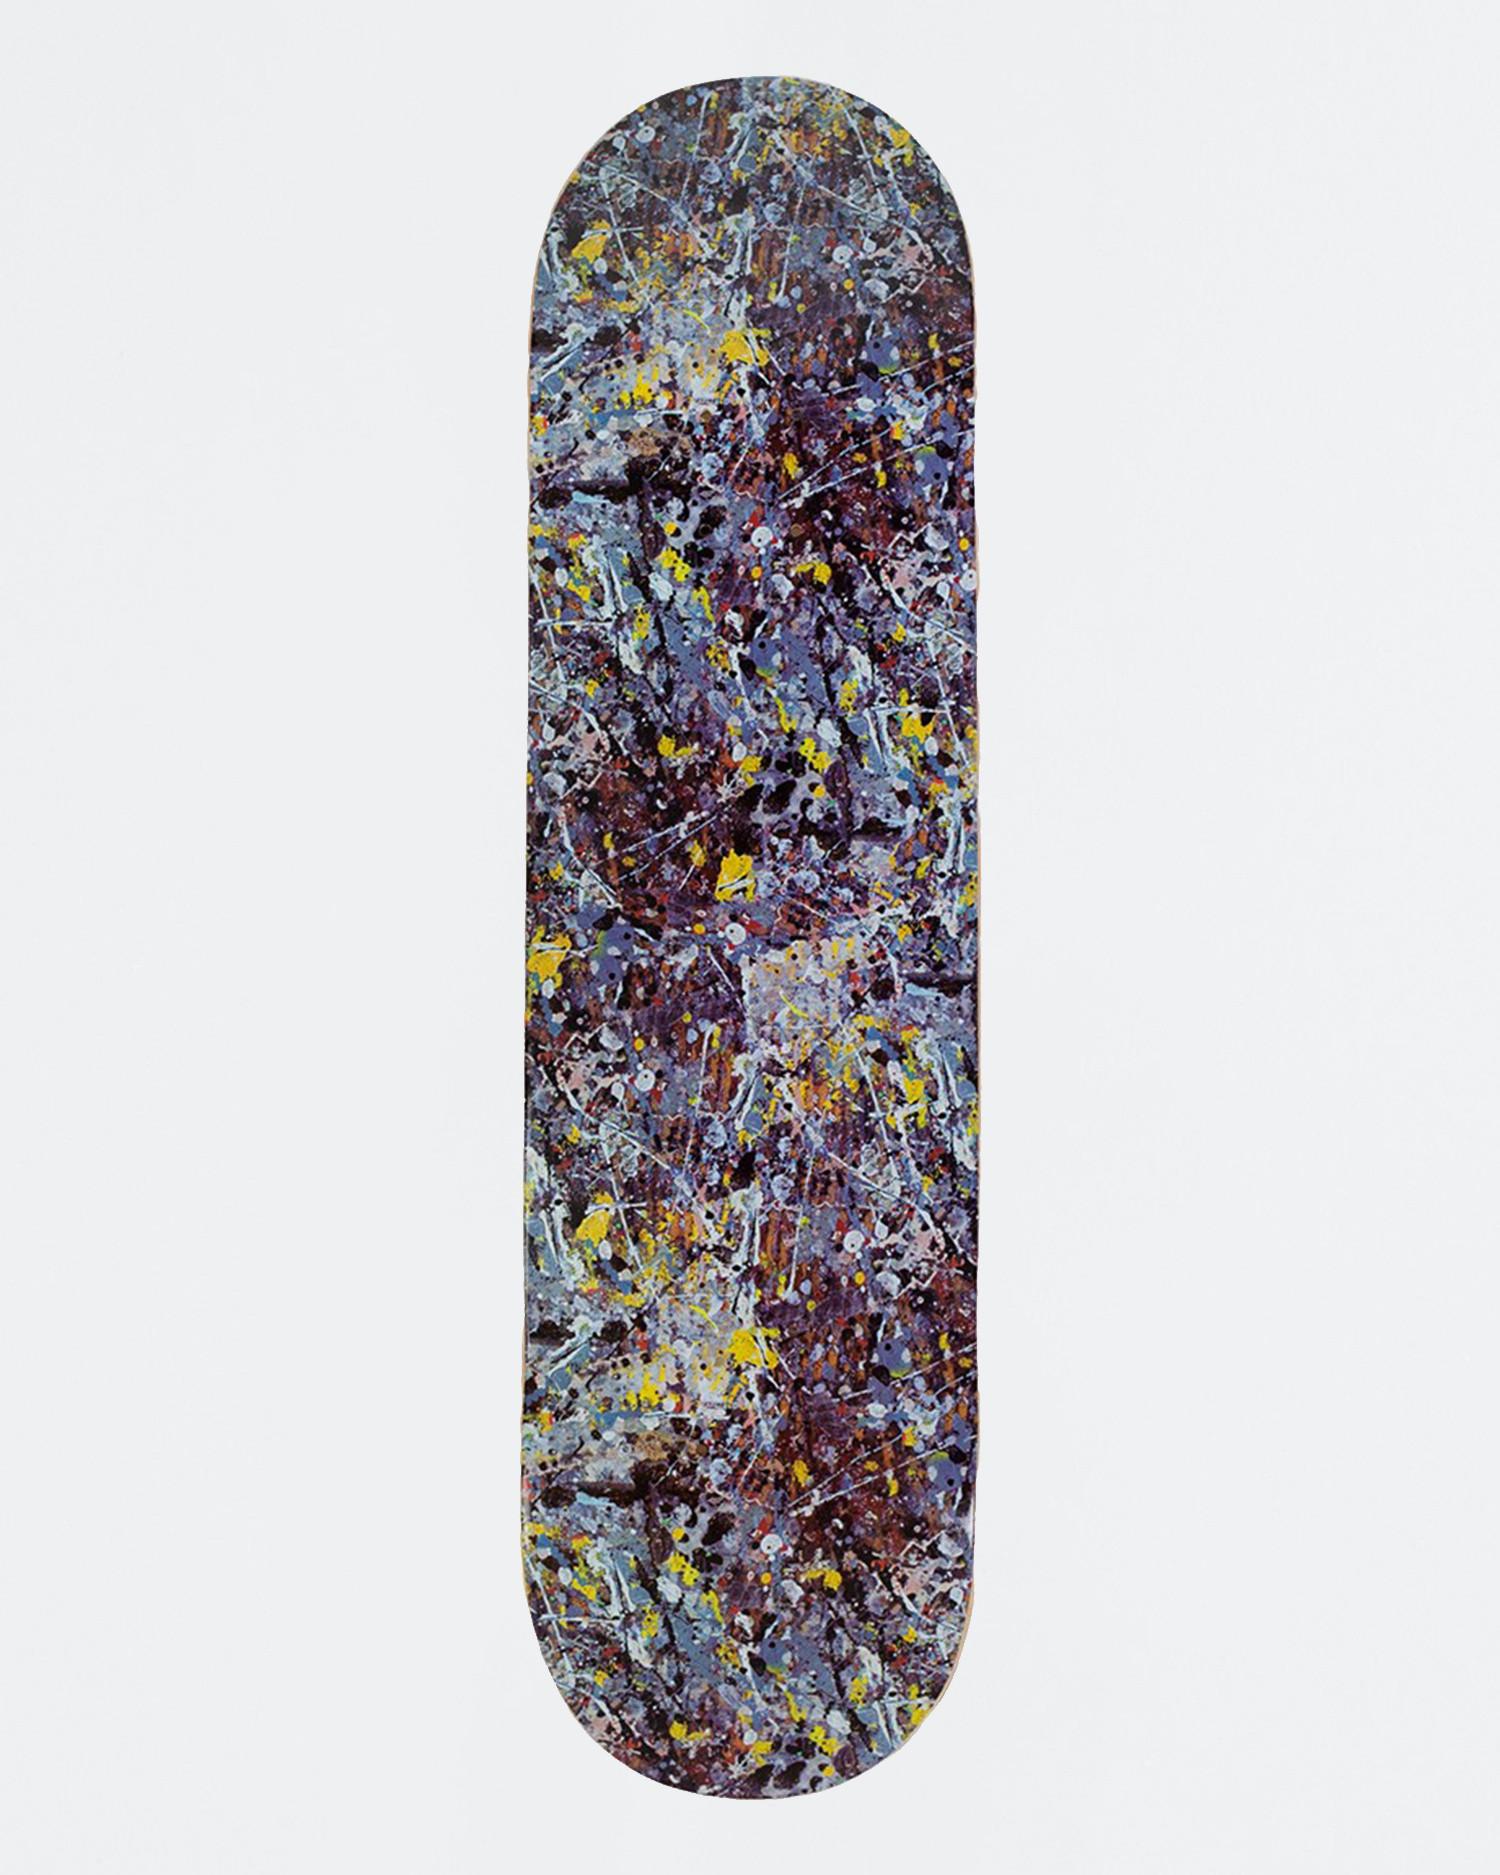 Sync. Jackson Pollock Studio Deck